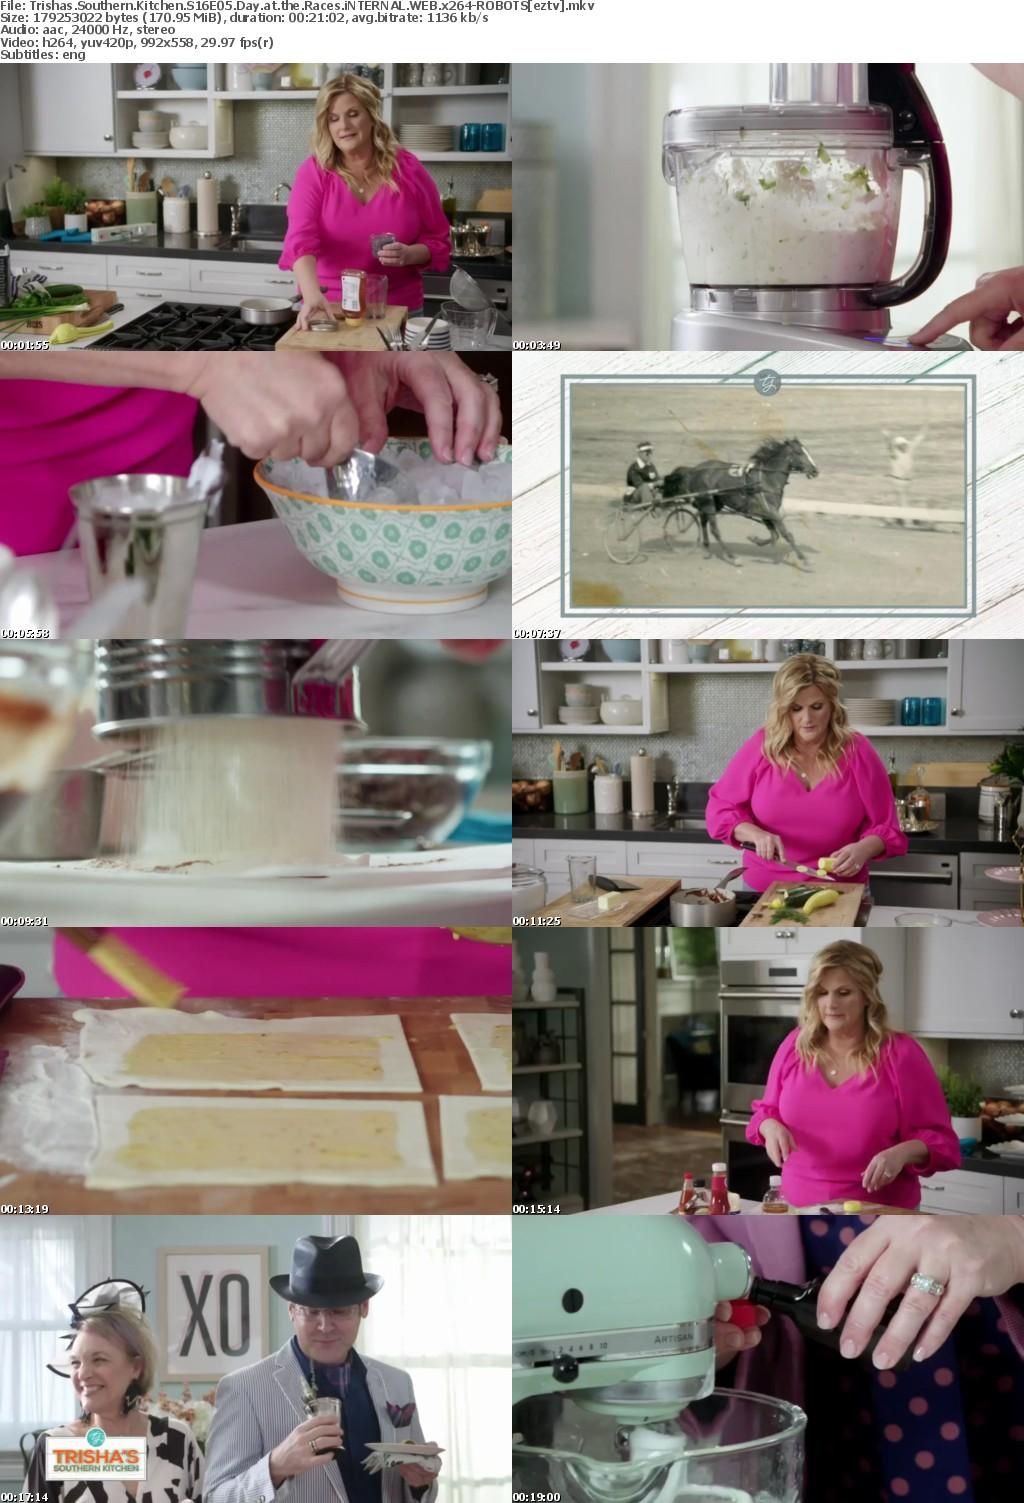 Trishas Southern Kitchen S16E05 Day at the Races iNTERNAL WEB x264-ROBOTS